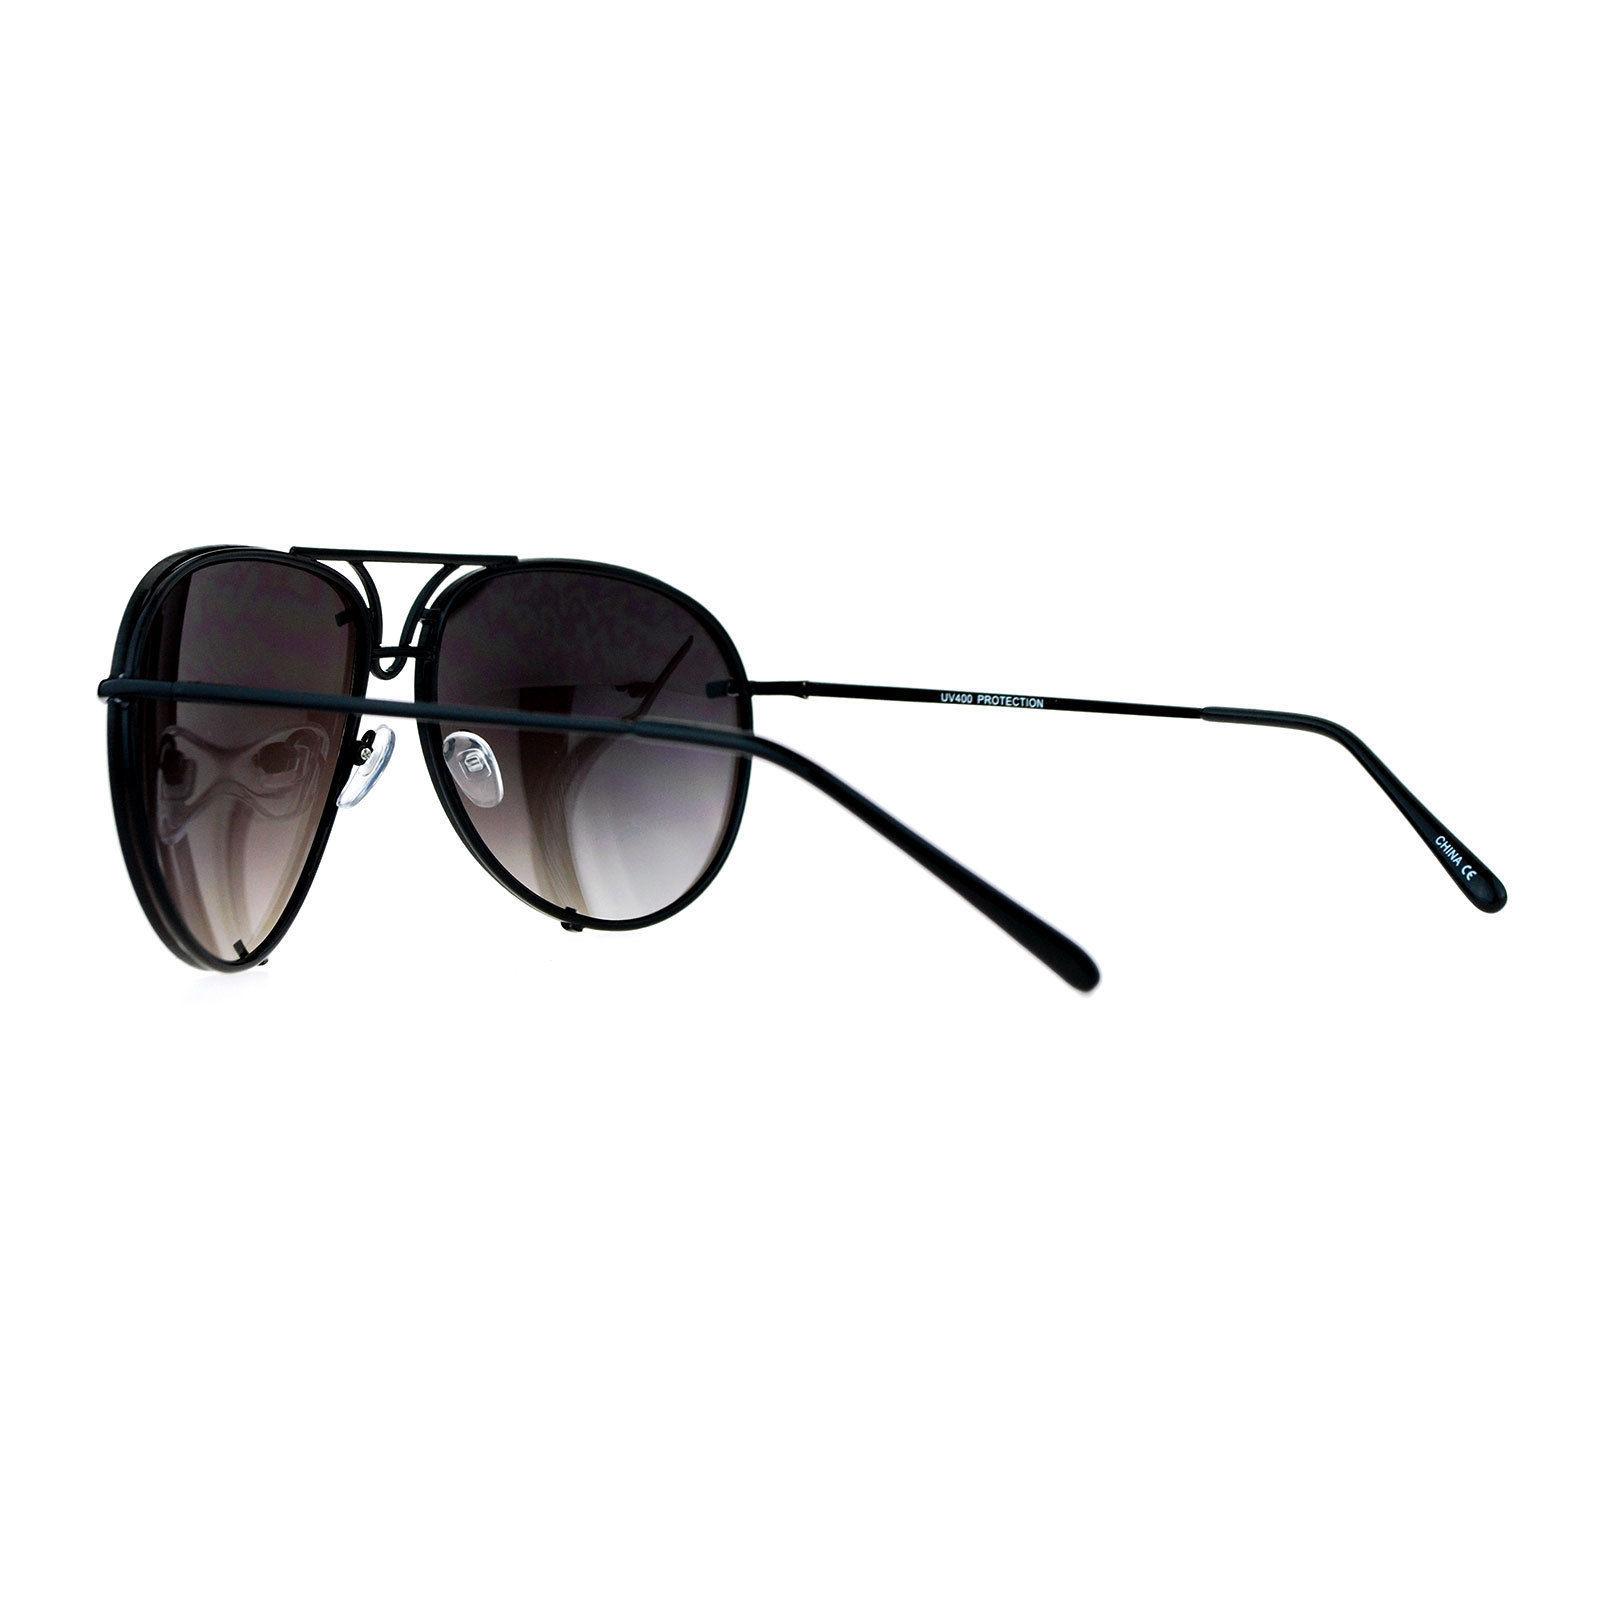 Oversized Round Aviator Sunglasses Mirror Lens Metal Rims in Back Spring Hinge